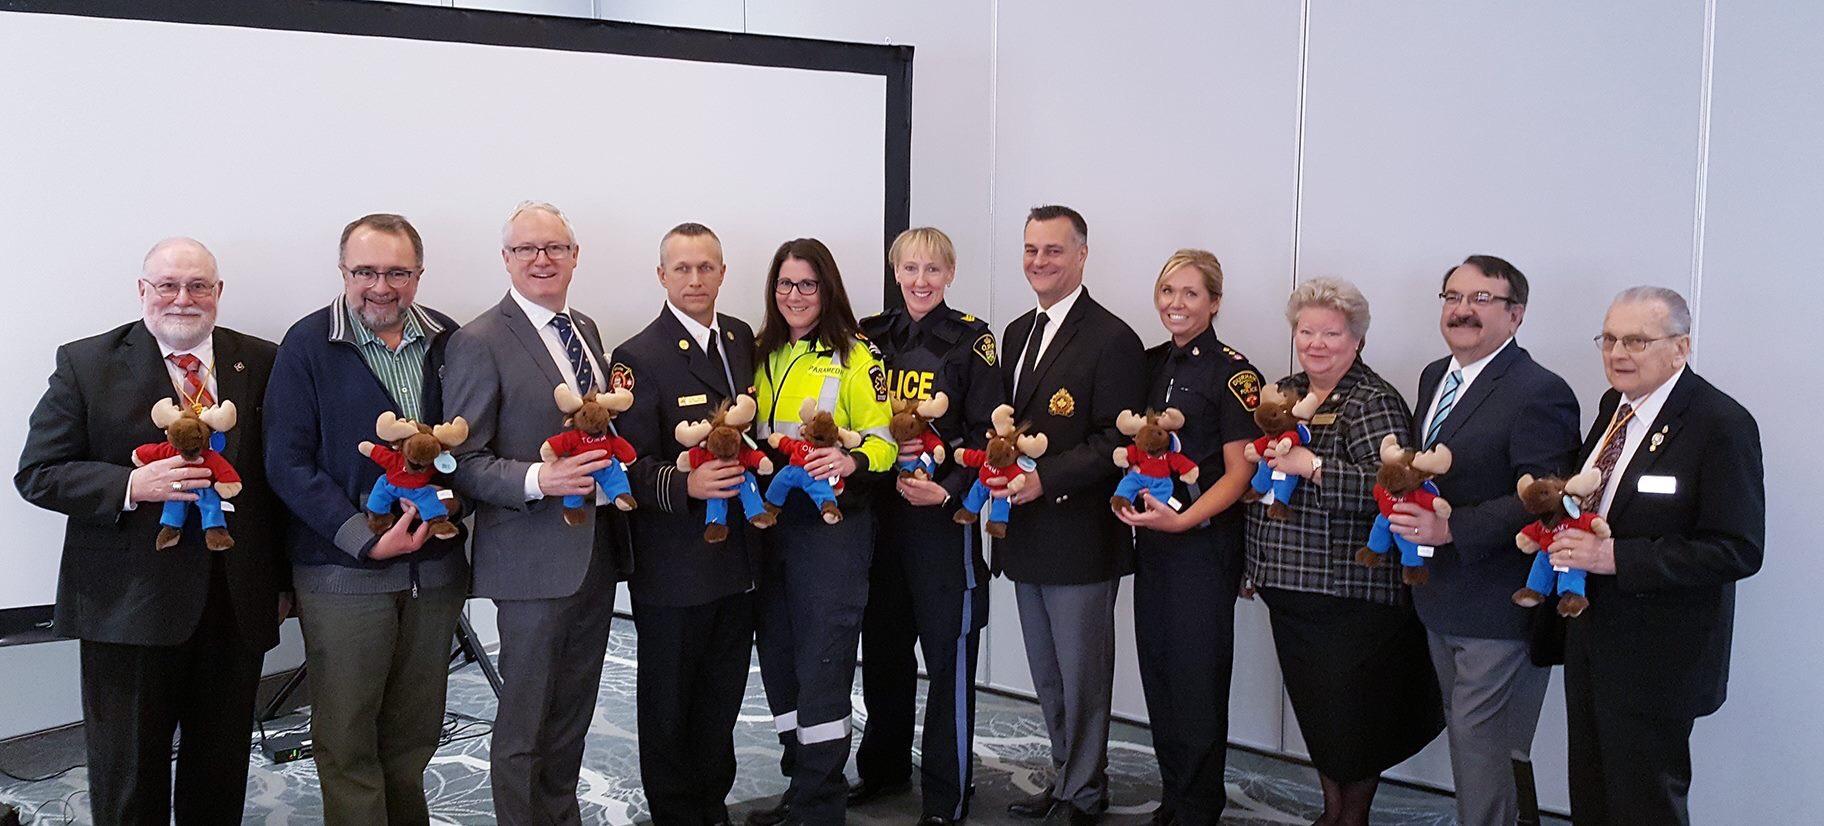 Dozens of plush toys donated to Durham Region first responders